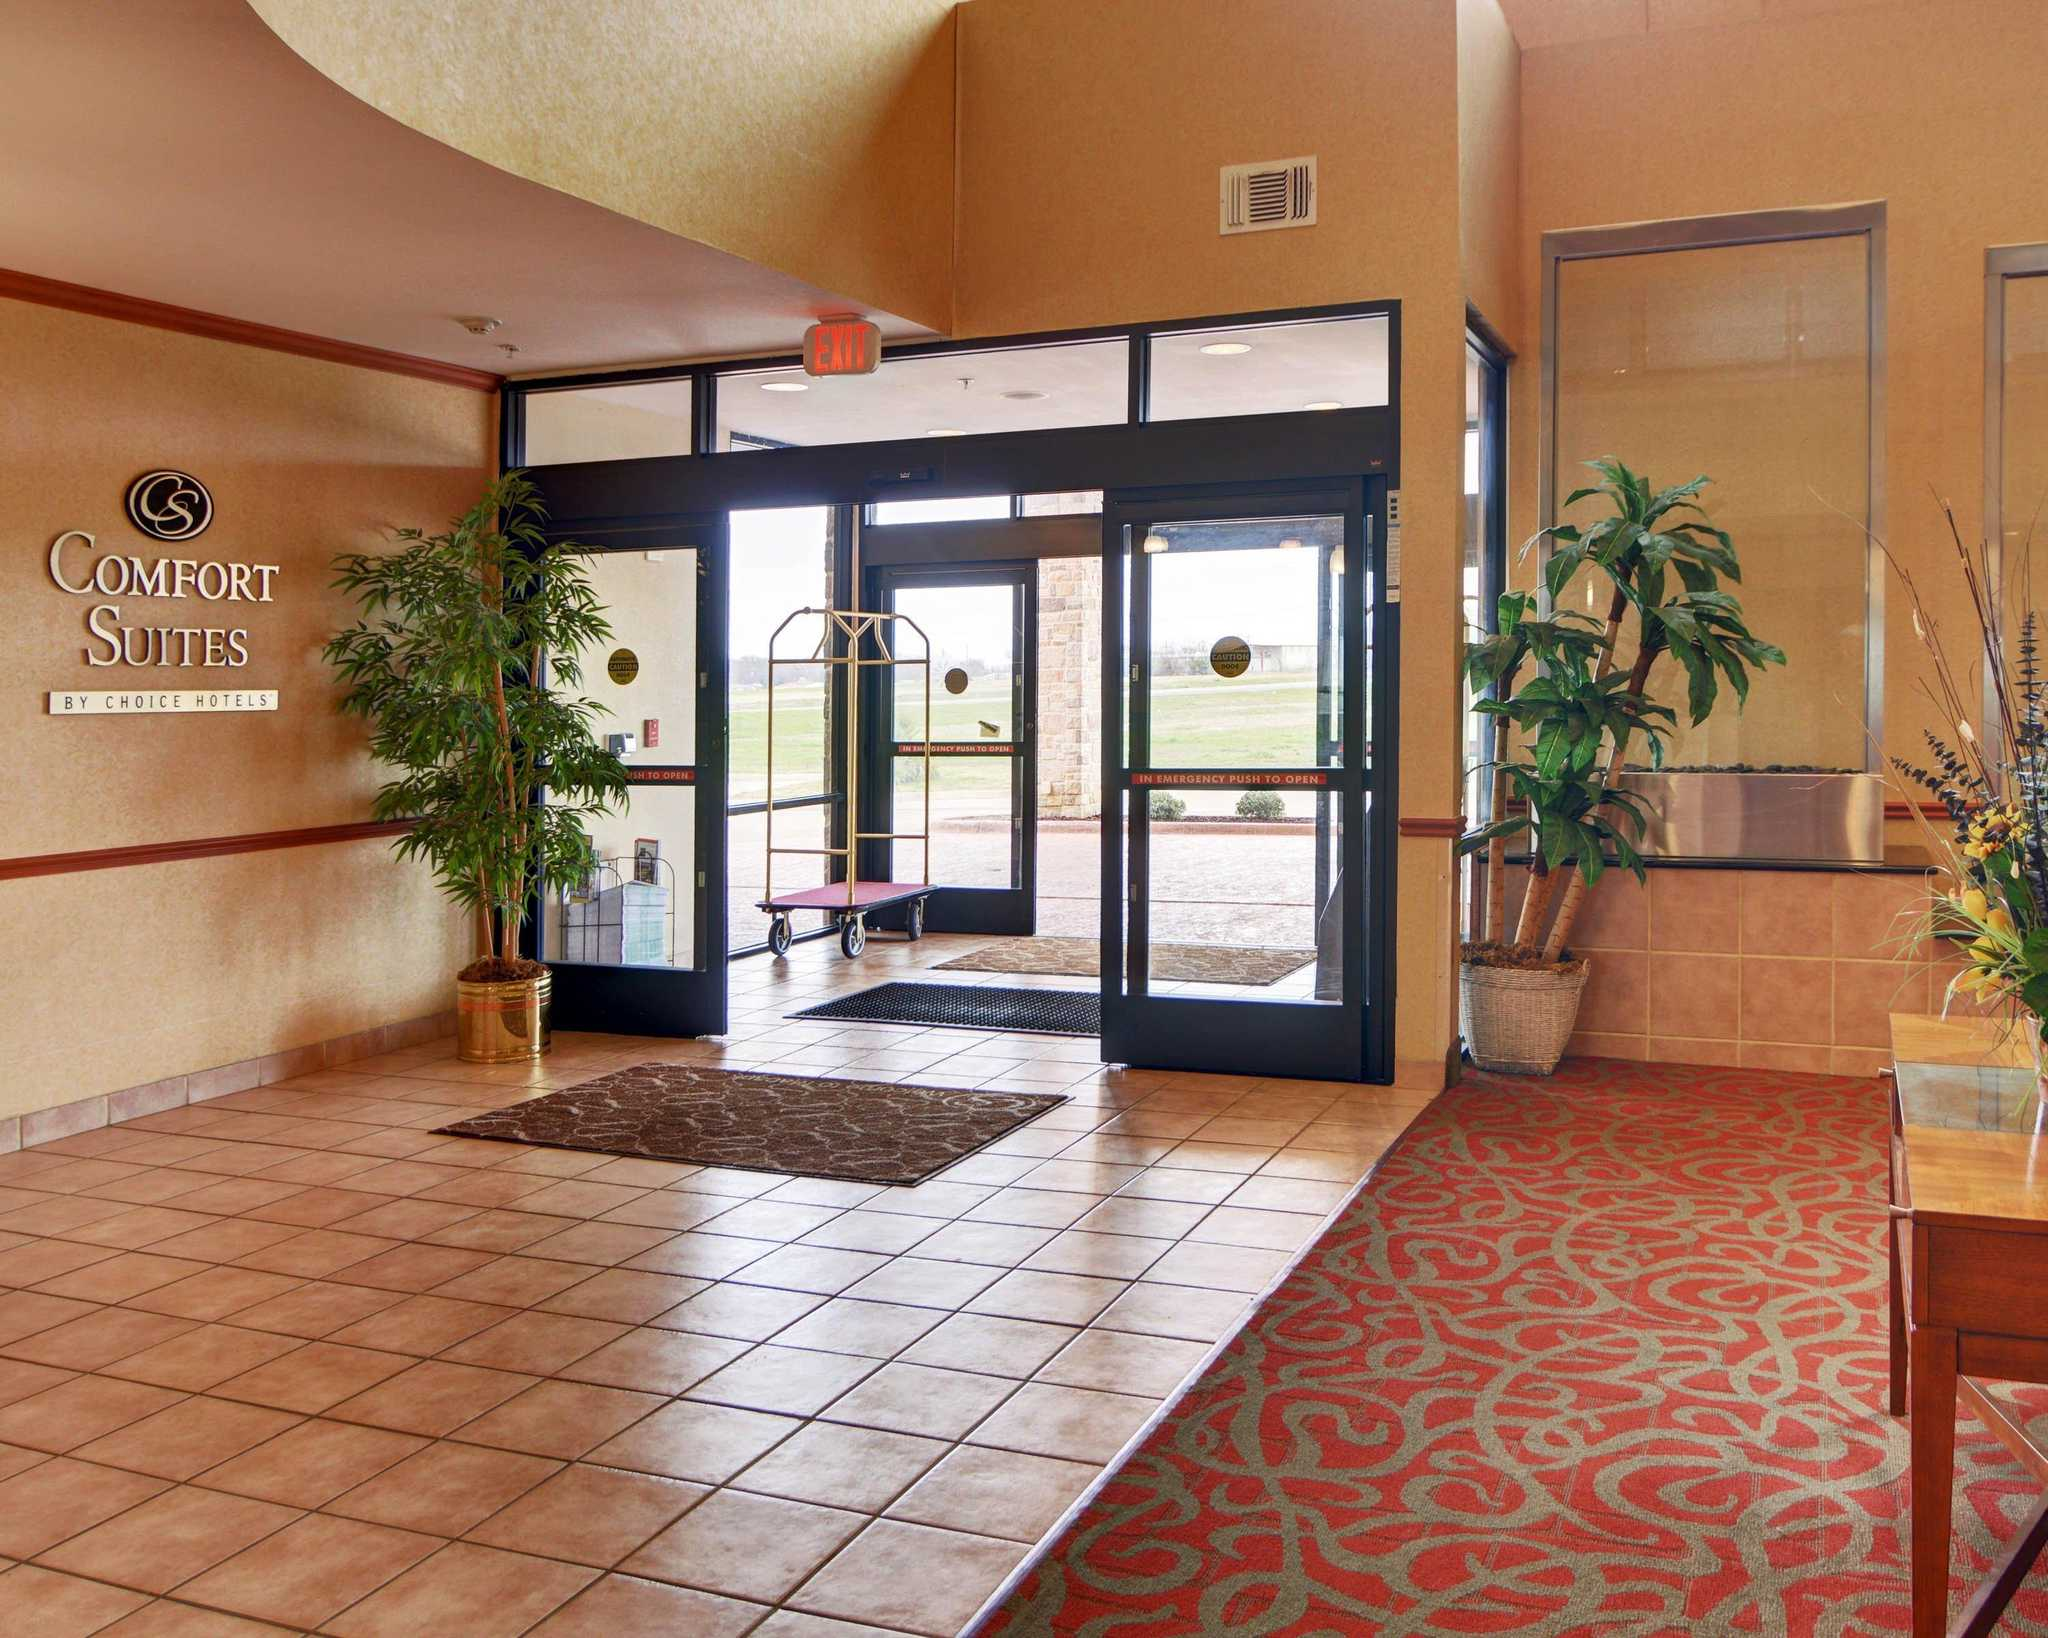 Comfort Suites Near Cedar Creek Lake image 10